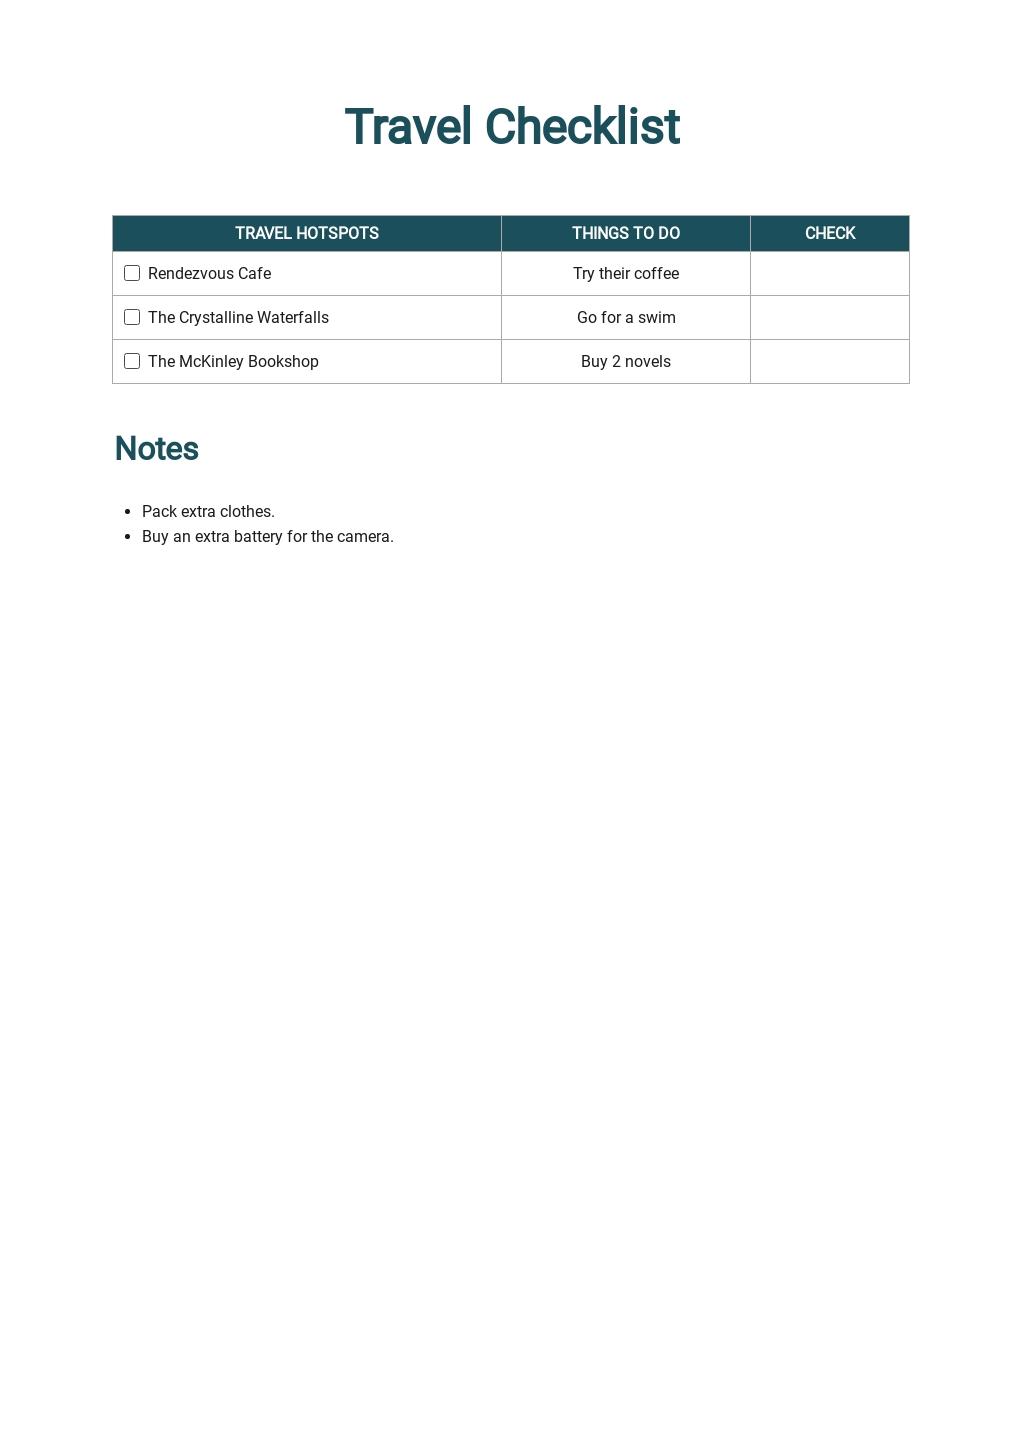 Travel Checklist Template.jpe